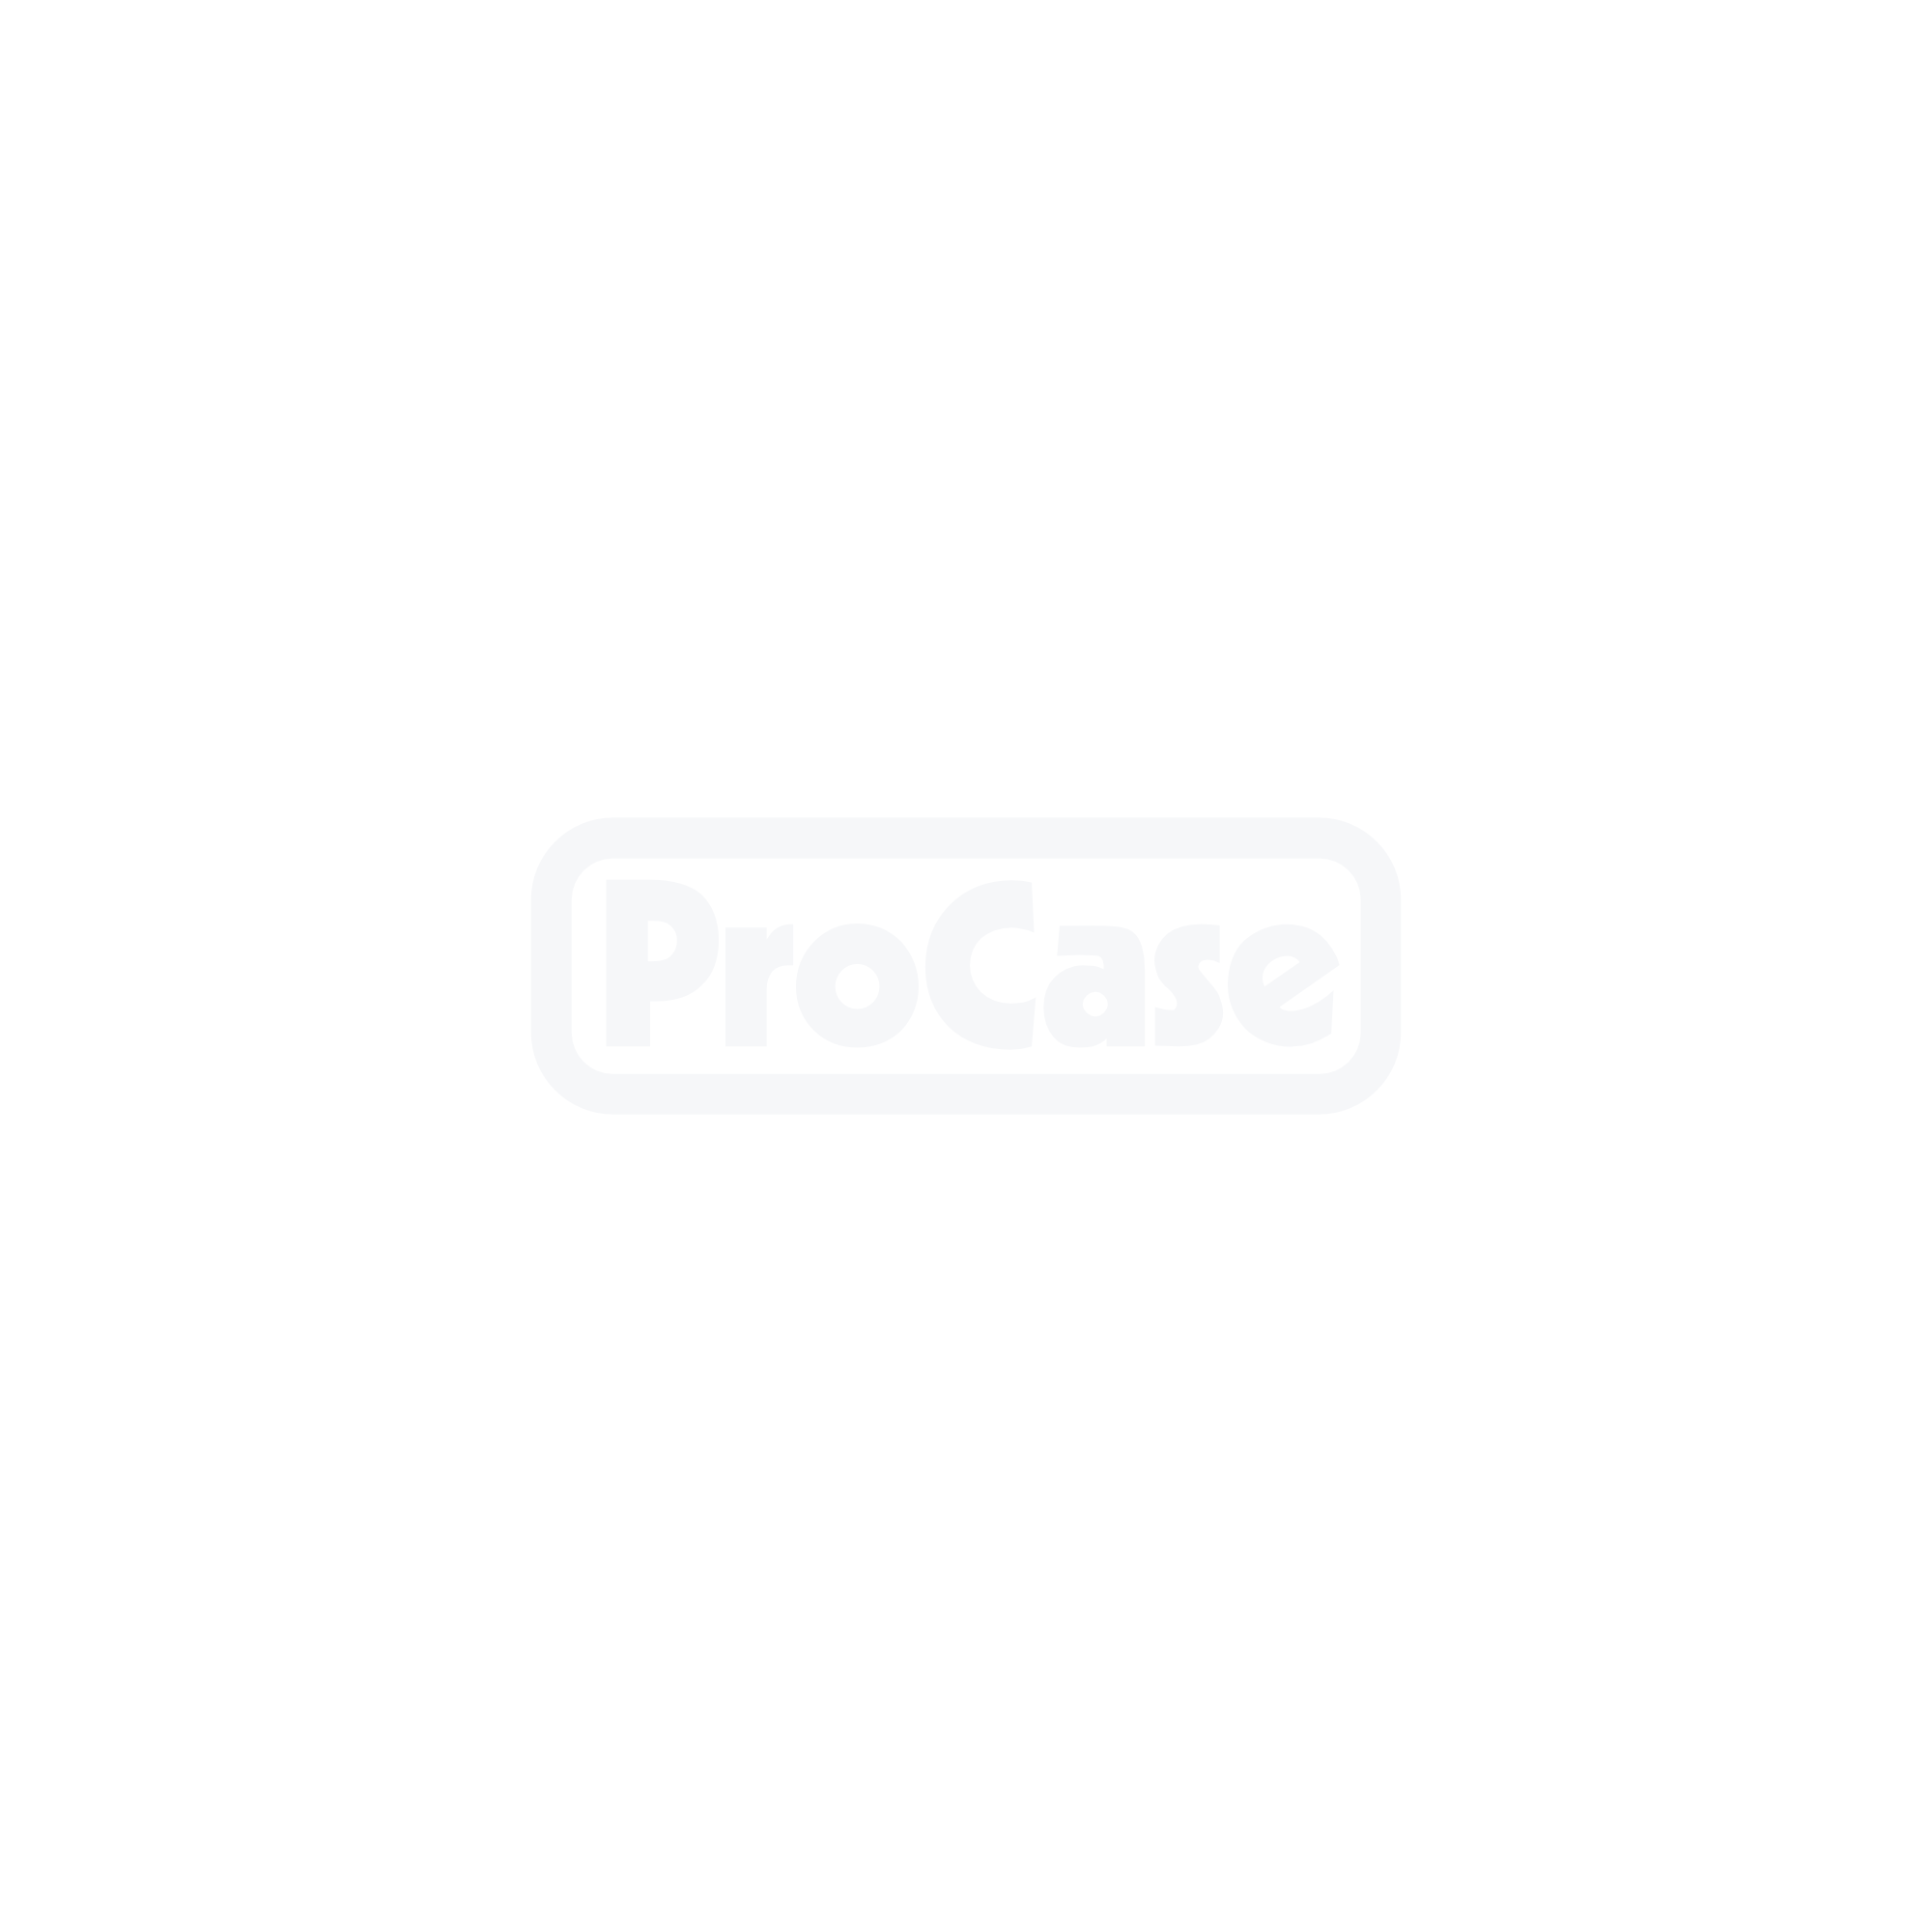 Flightcase für 2 Panasonic TH-50 PHW 6EX